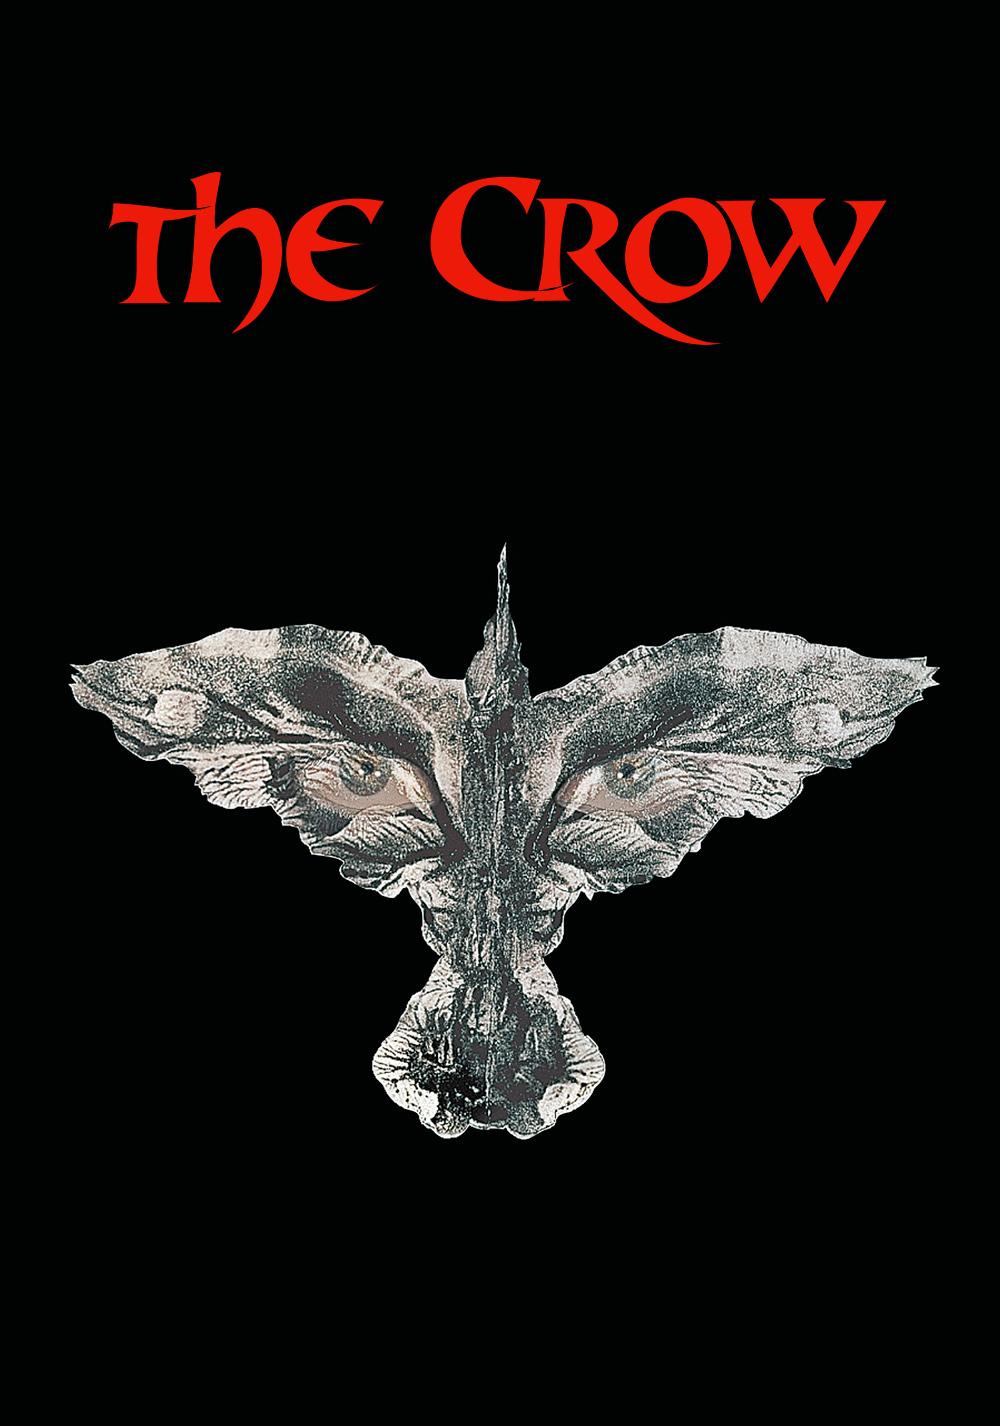 the-crow-532f9fe2e3355.jpg